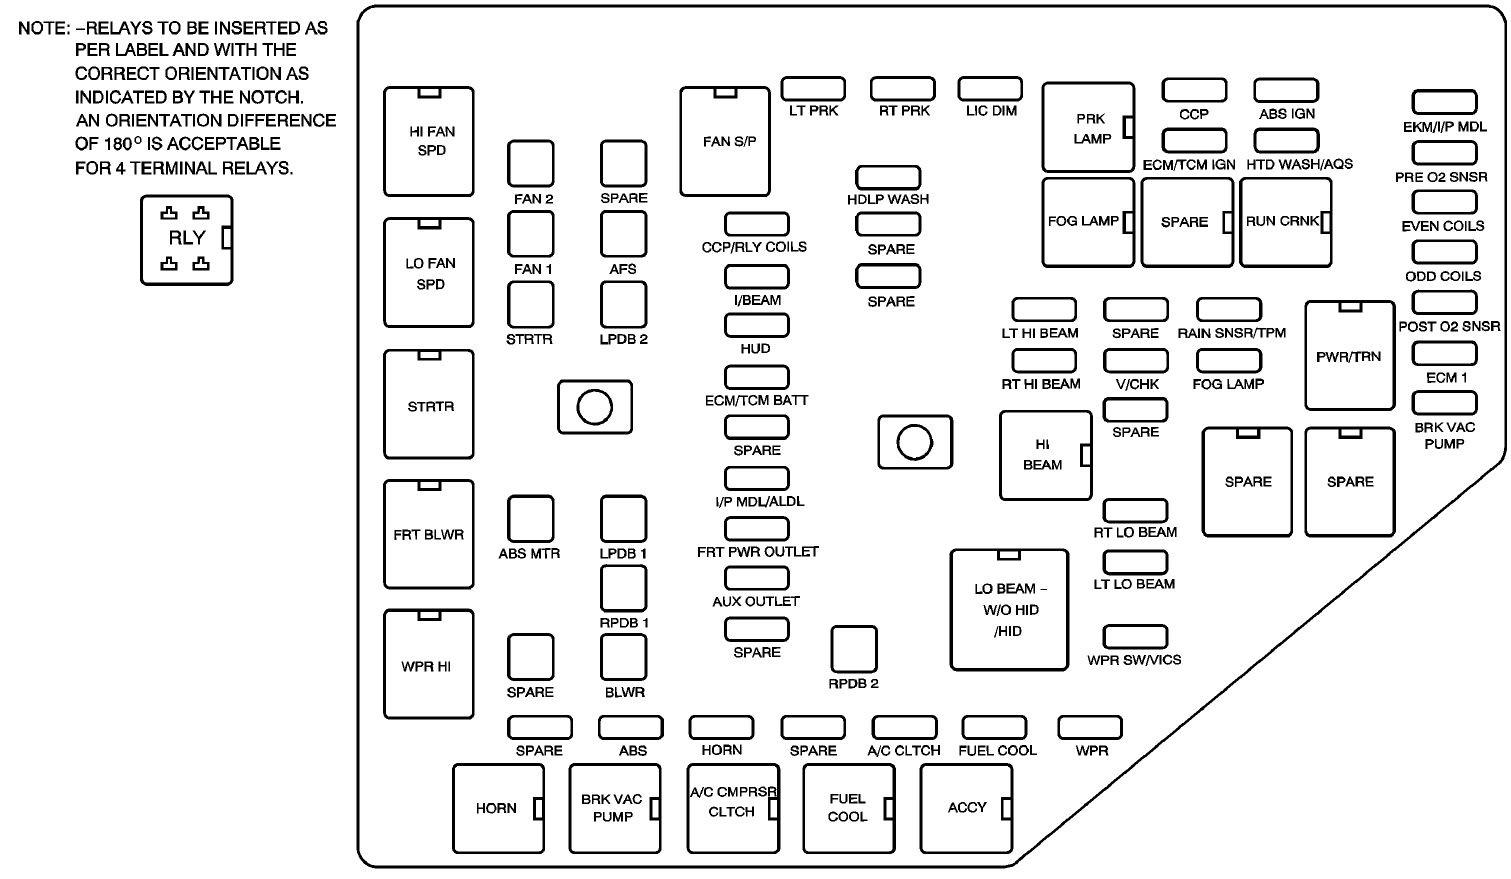 [SCHEMATICS_4NL]  9F5414 2009 Gmc Acadia Fuse Box | Wiring Resources | 12 Volt Relay 56006707 Wiring Diagrams |  | Wiring Resources